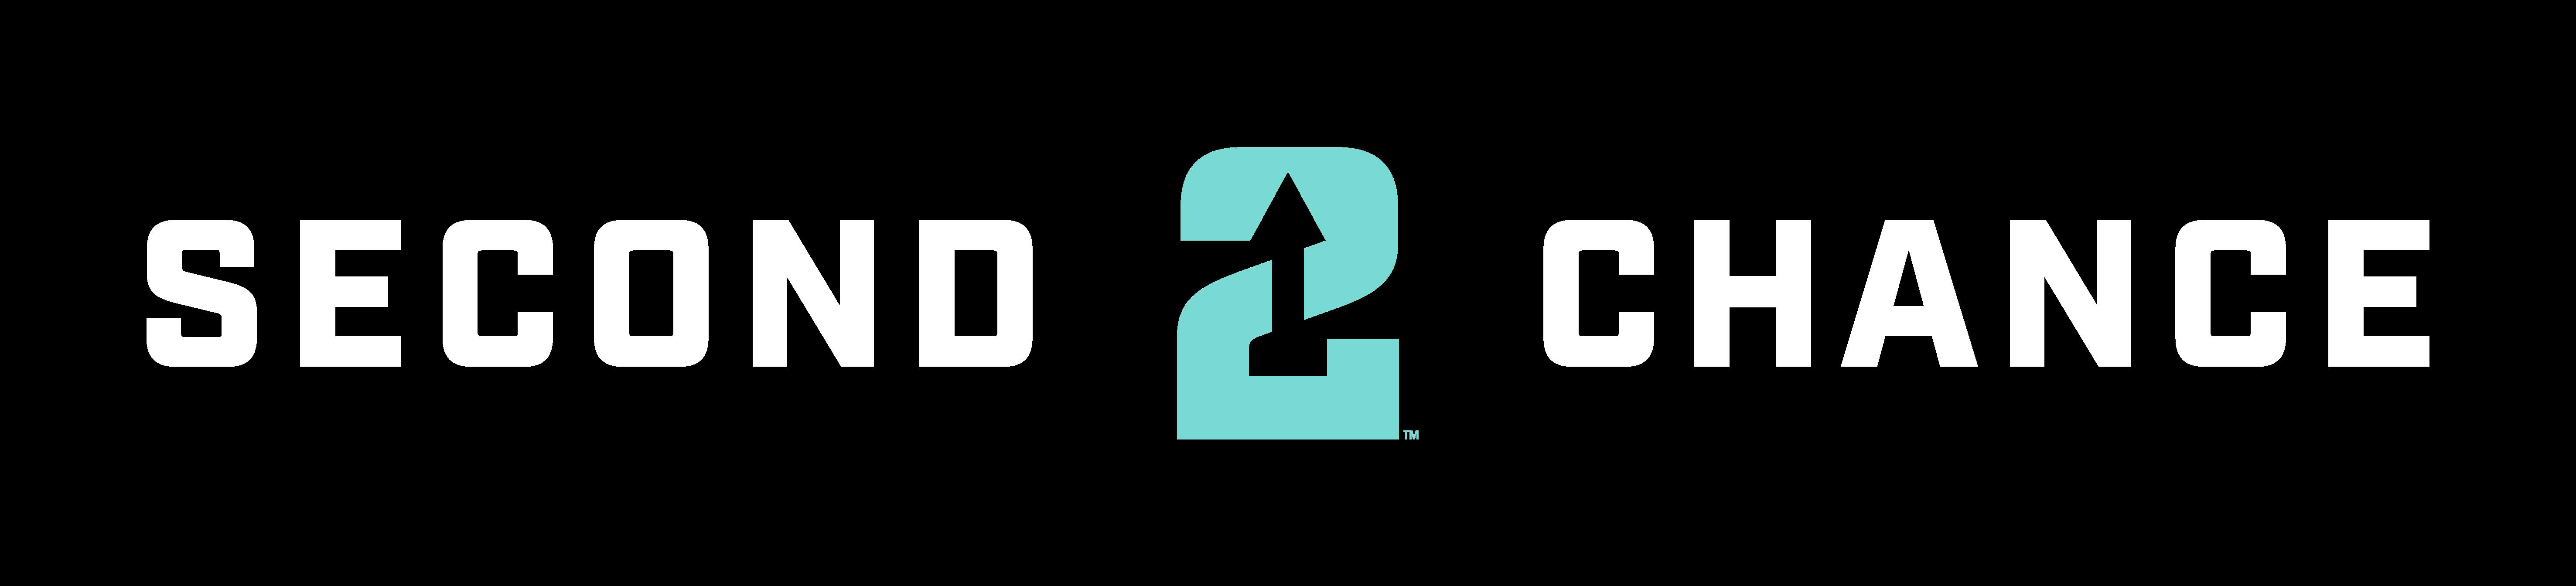 Second Chance - Branding